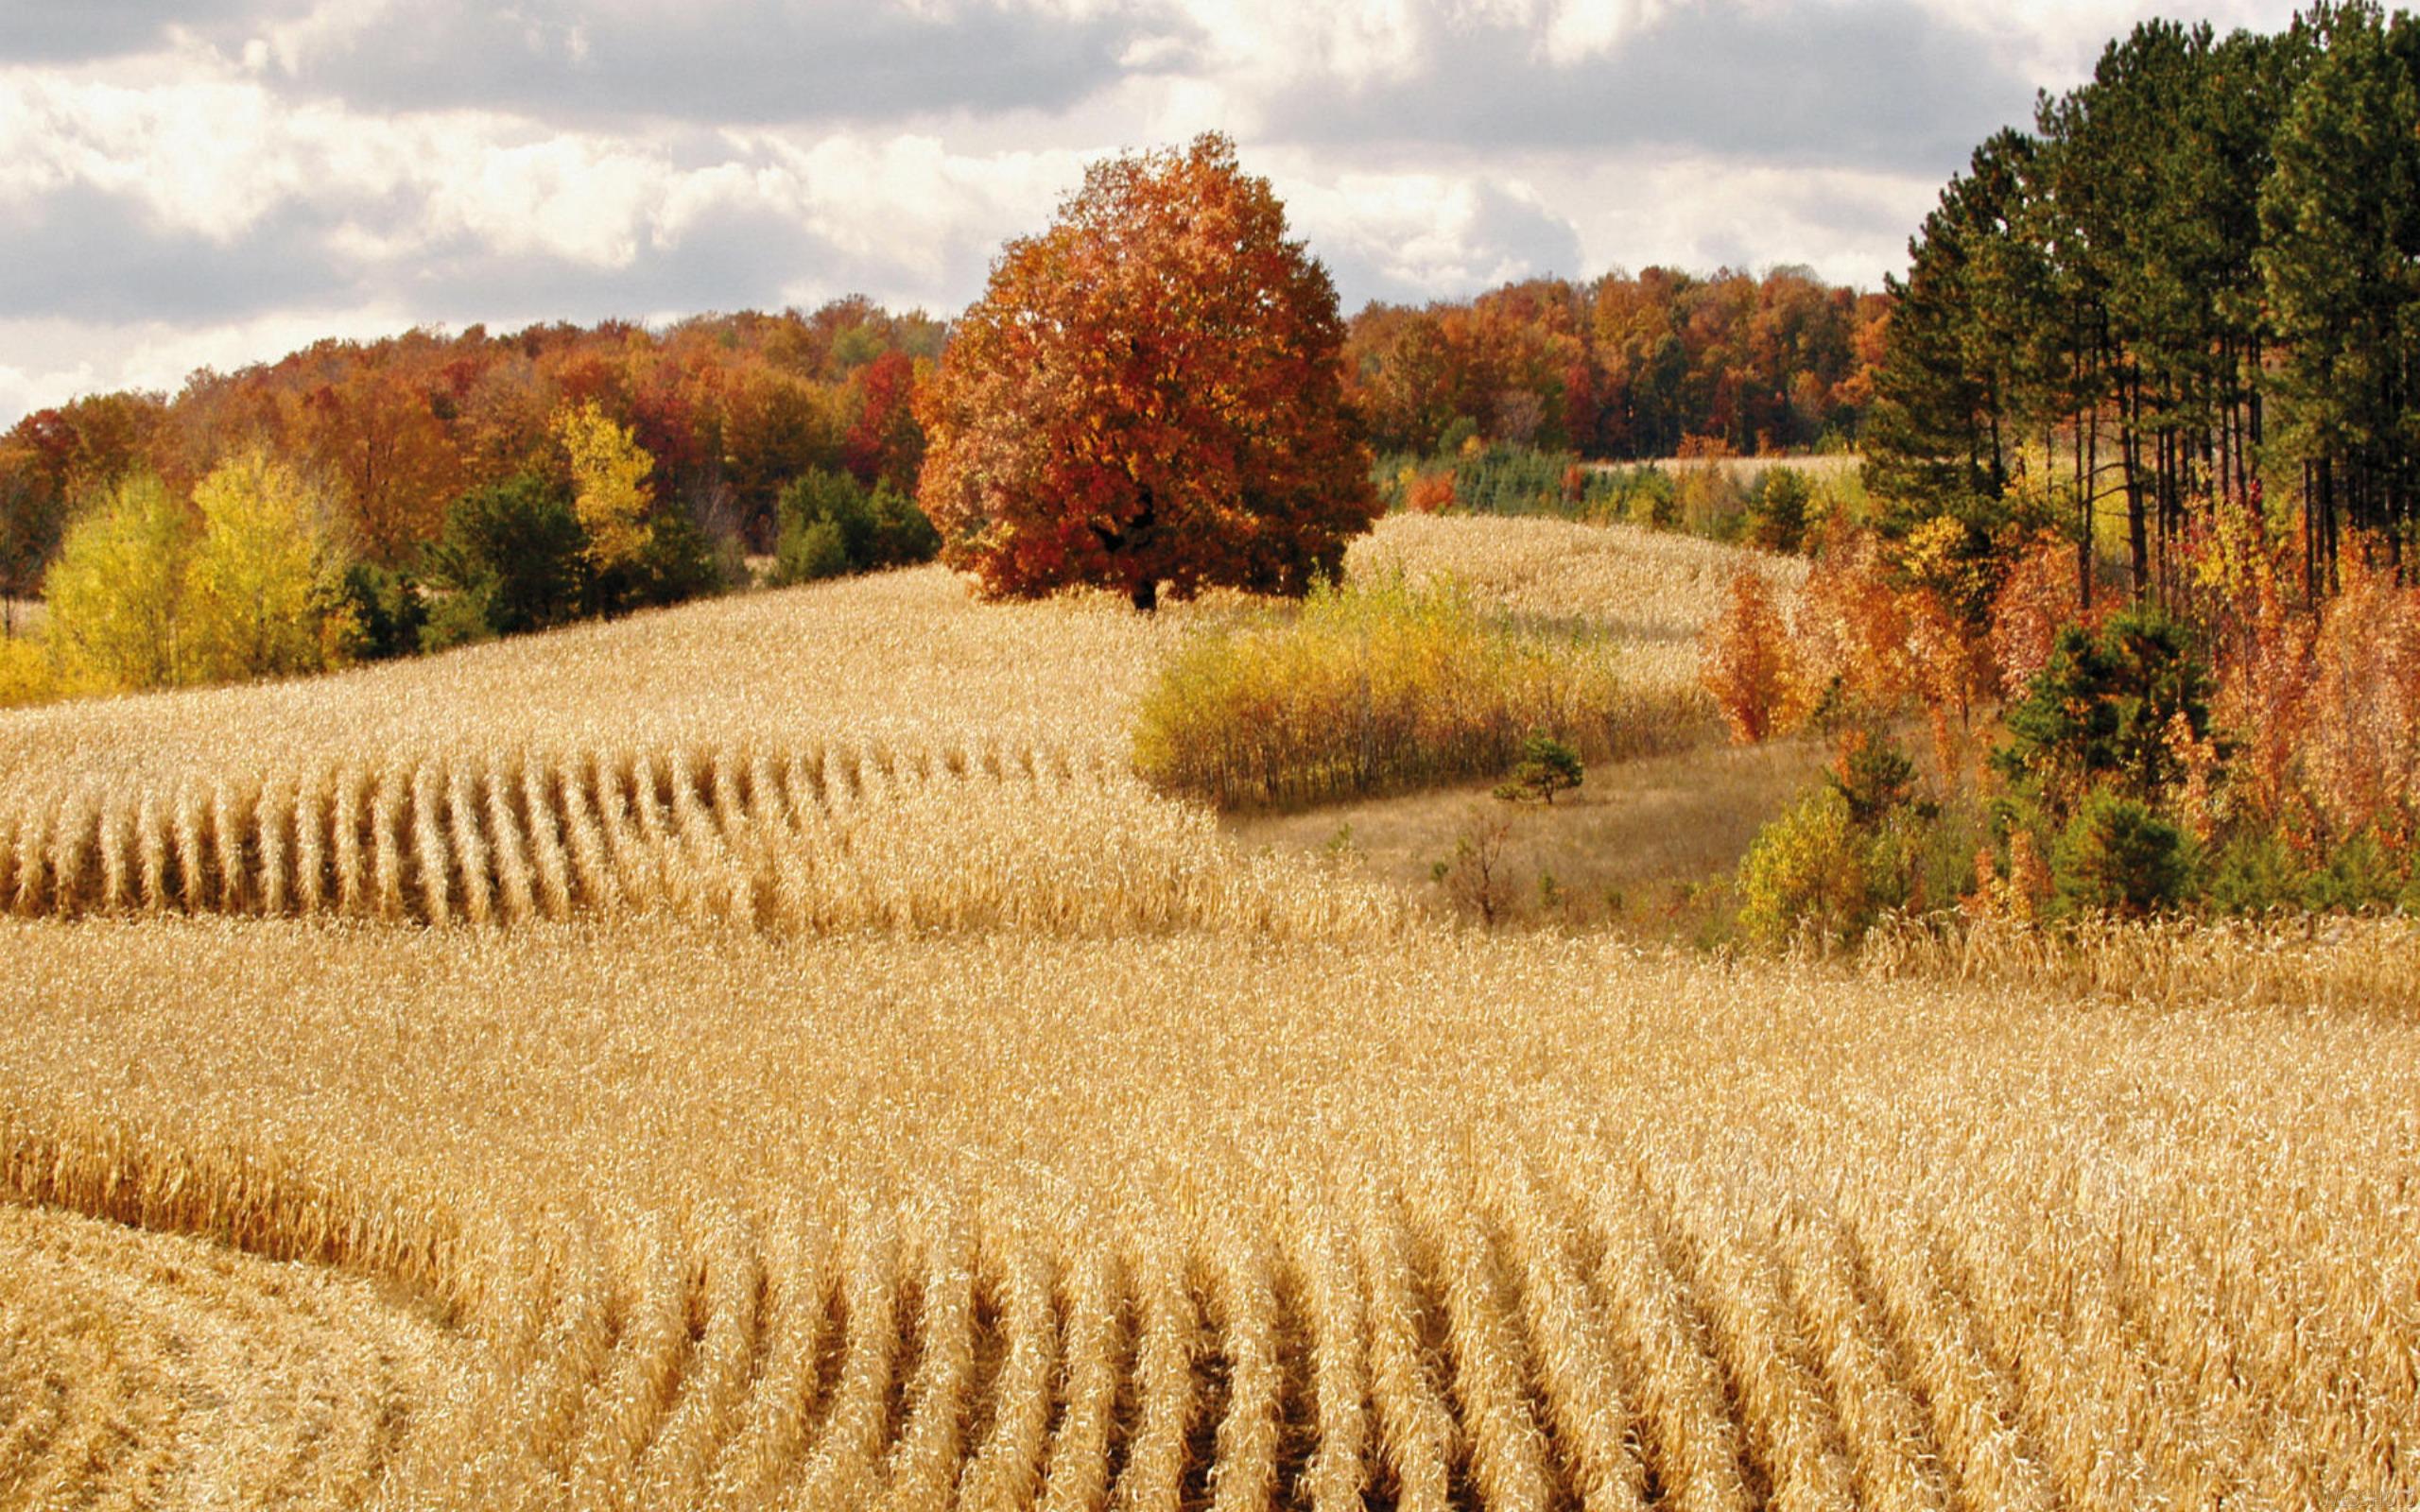 Drawn wheat Field Wheat Drawing Wheat Drawing